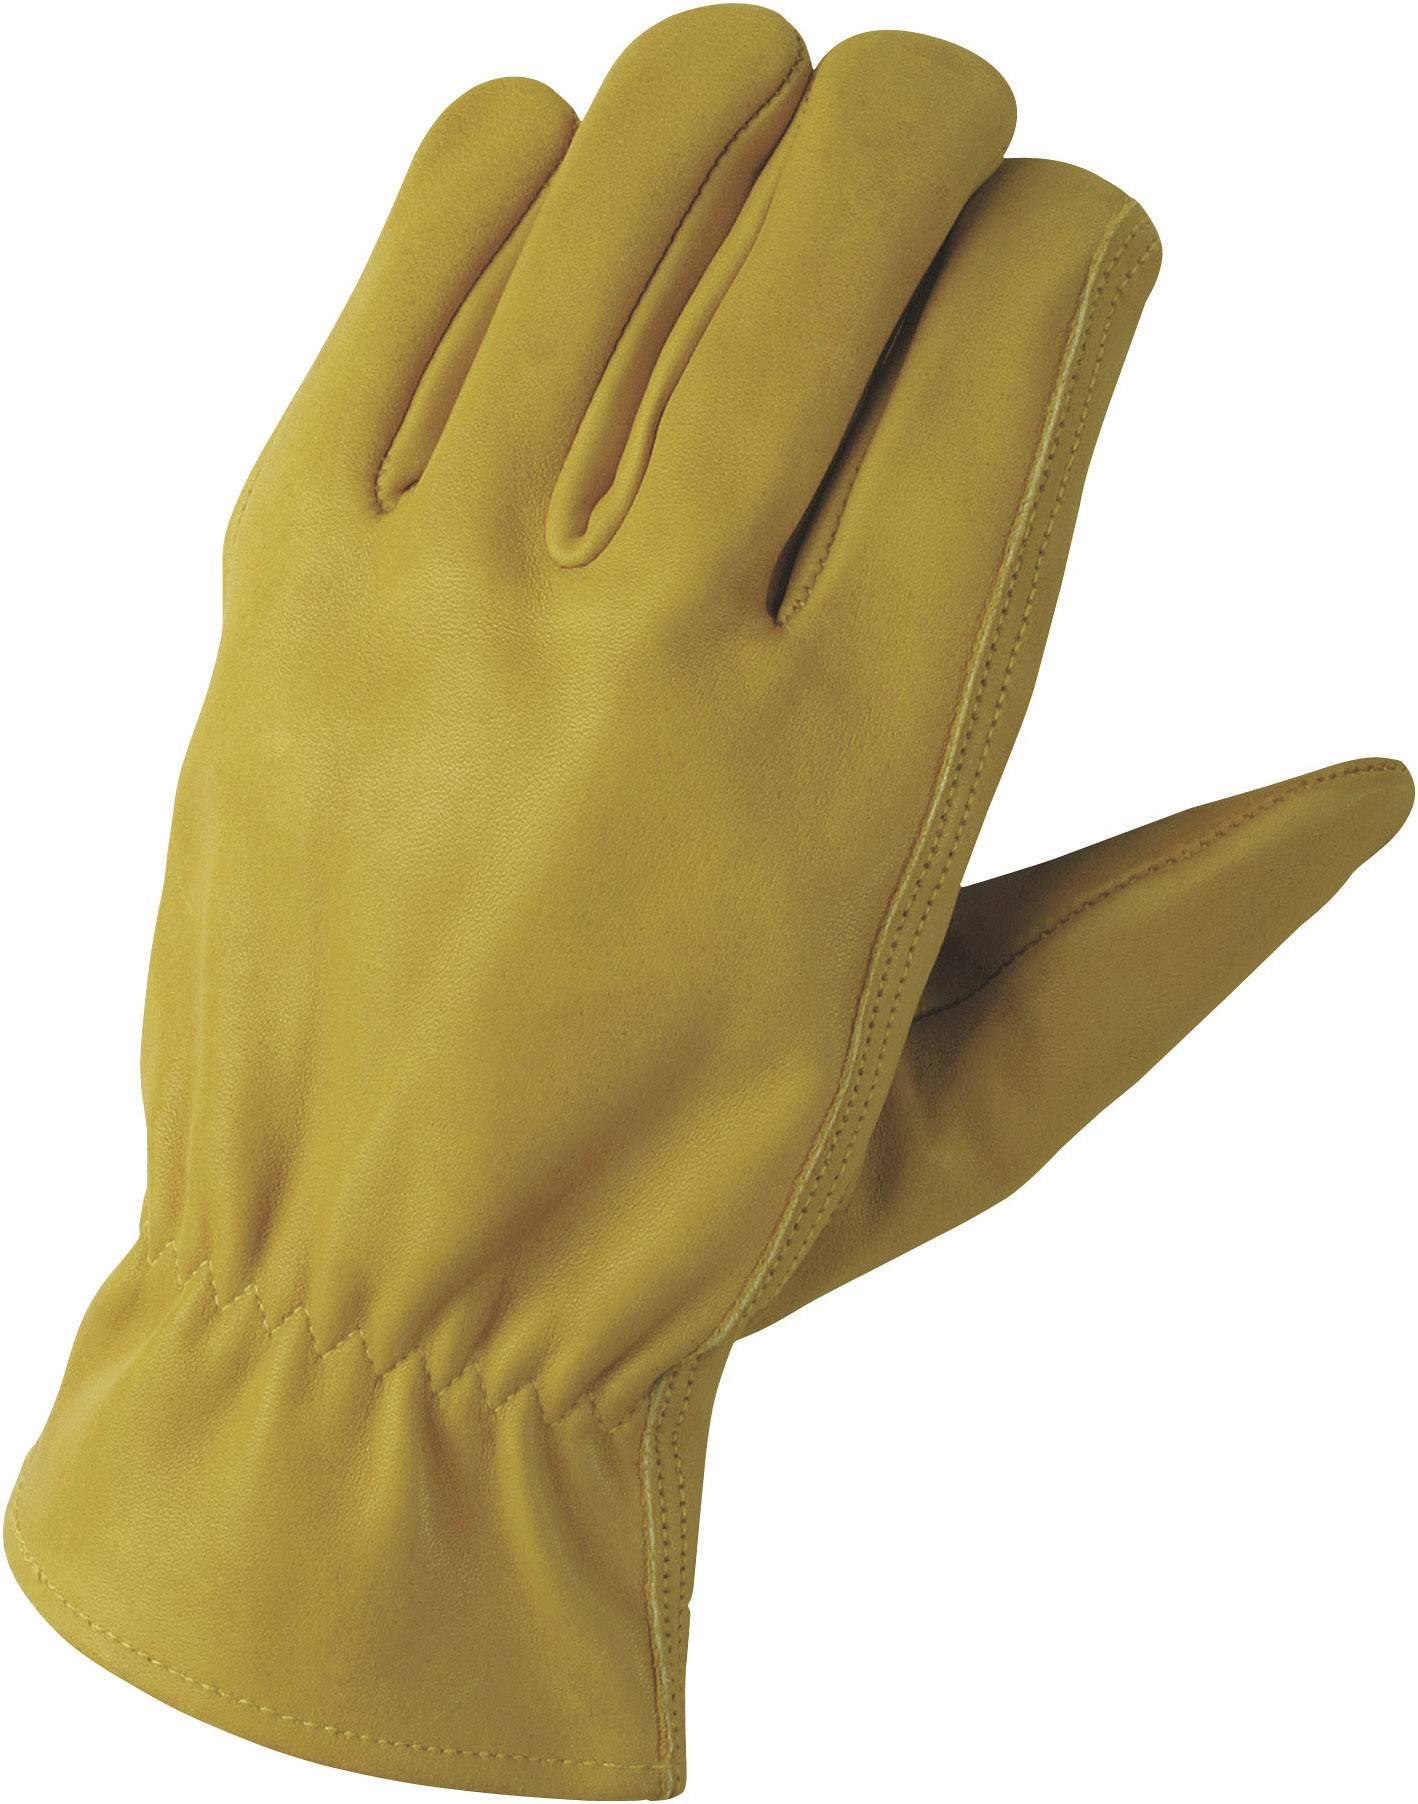 Montážne rukavice FerdyF. Conductor Garten 1610, velikost rukavic: 9, L